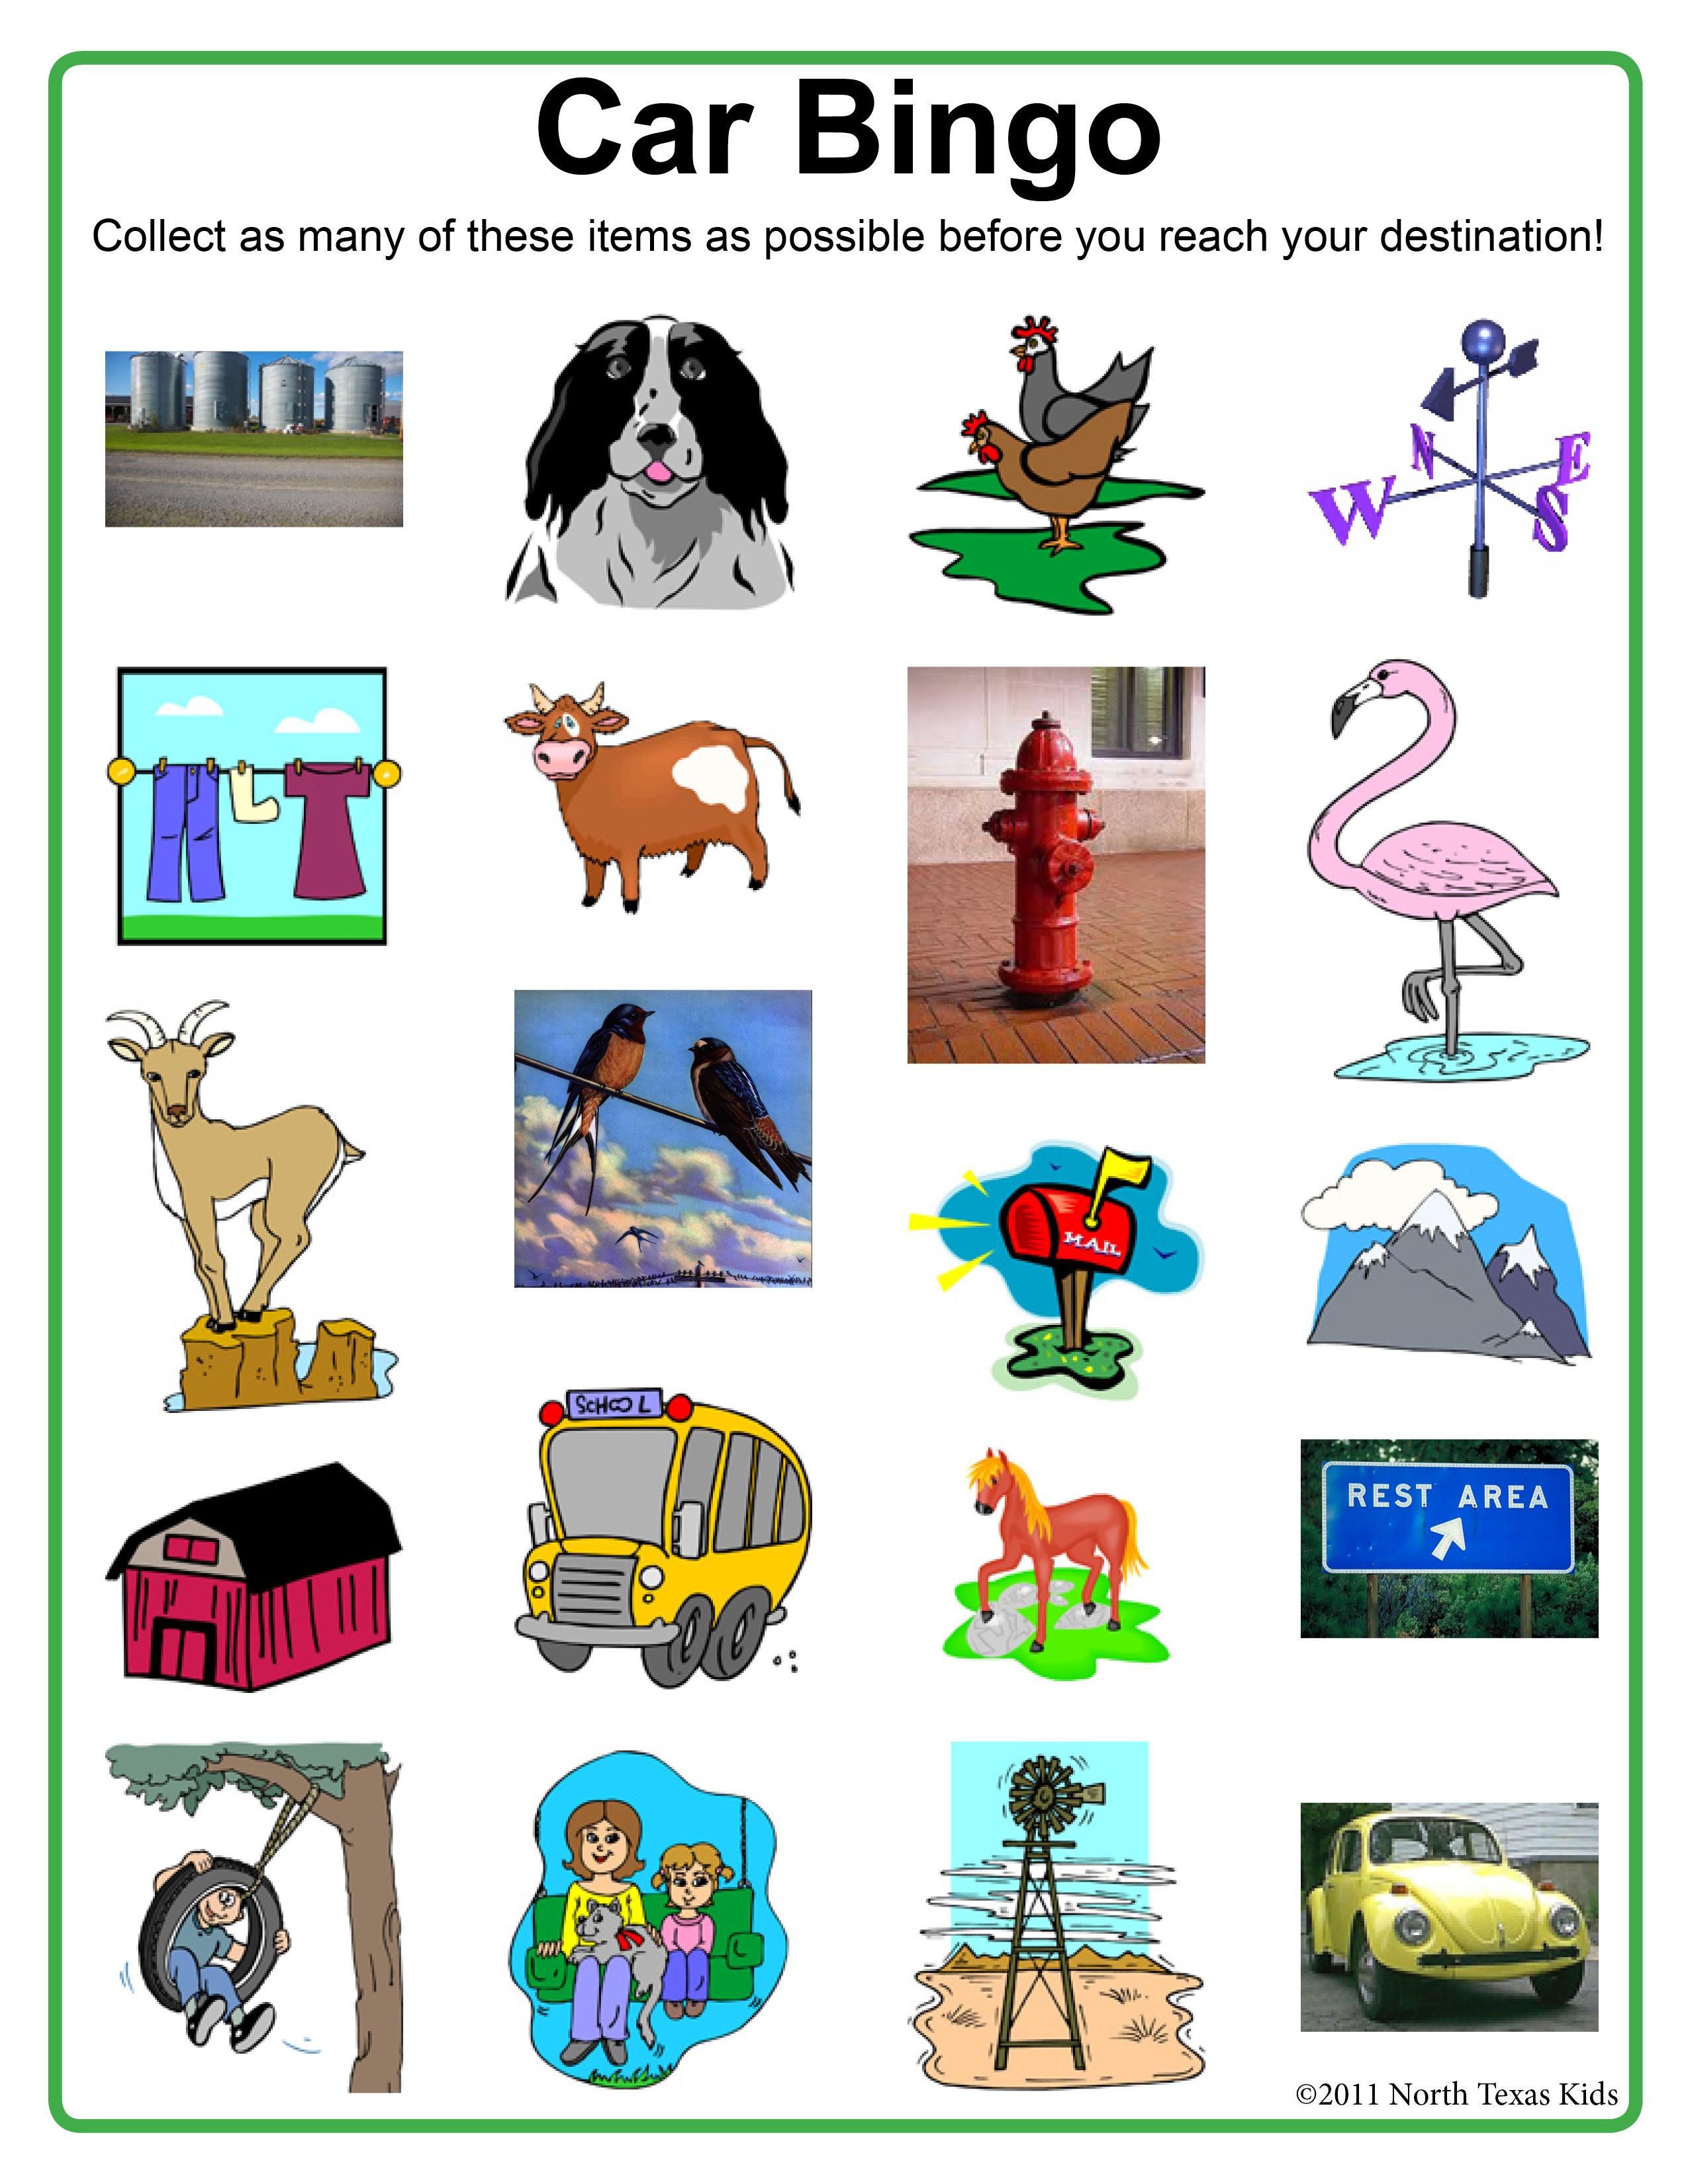 4 Images of Car Brand Bingo Games Printable